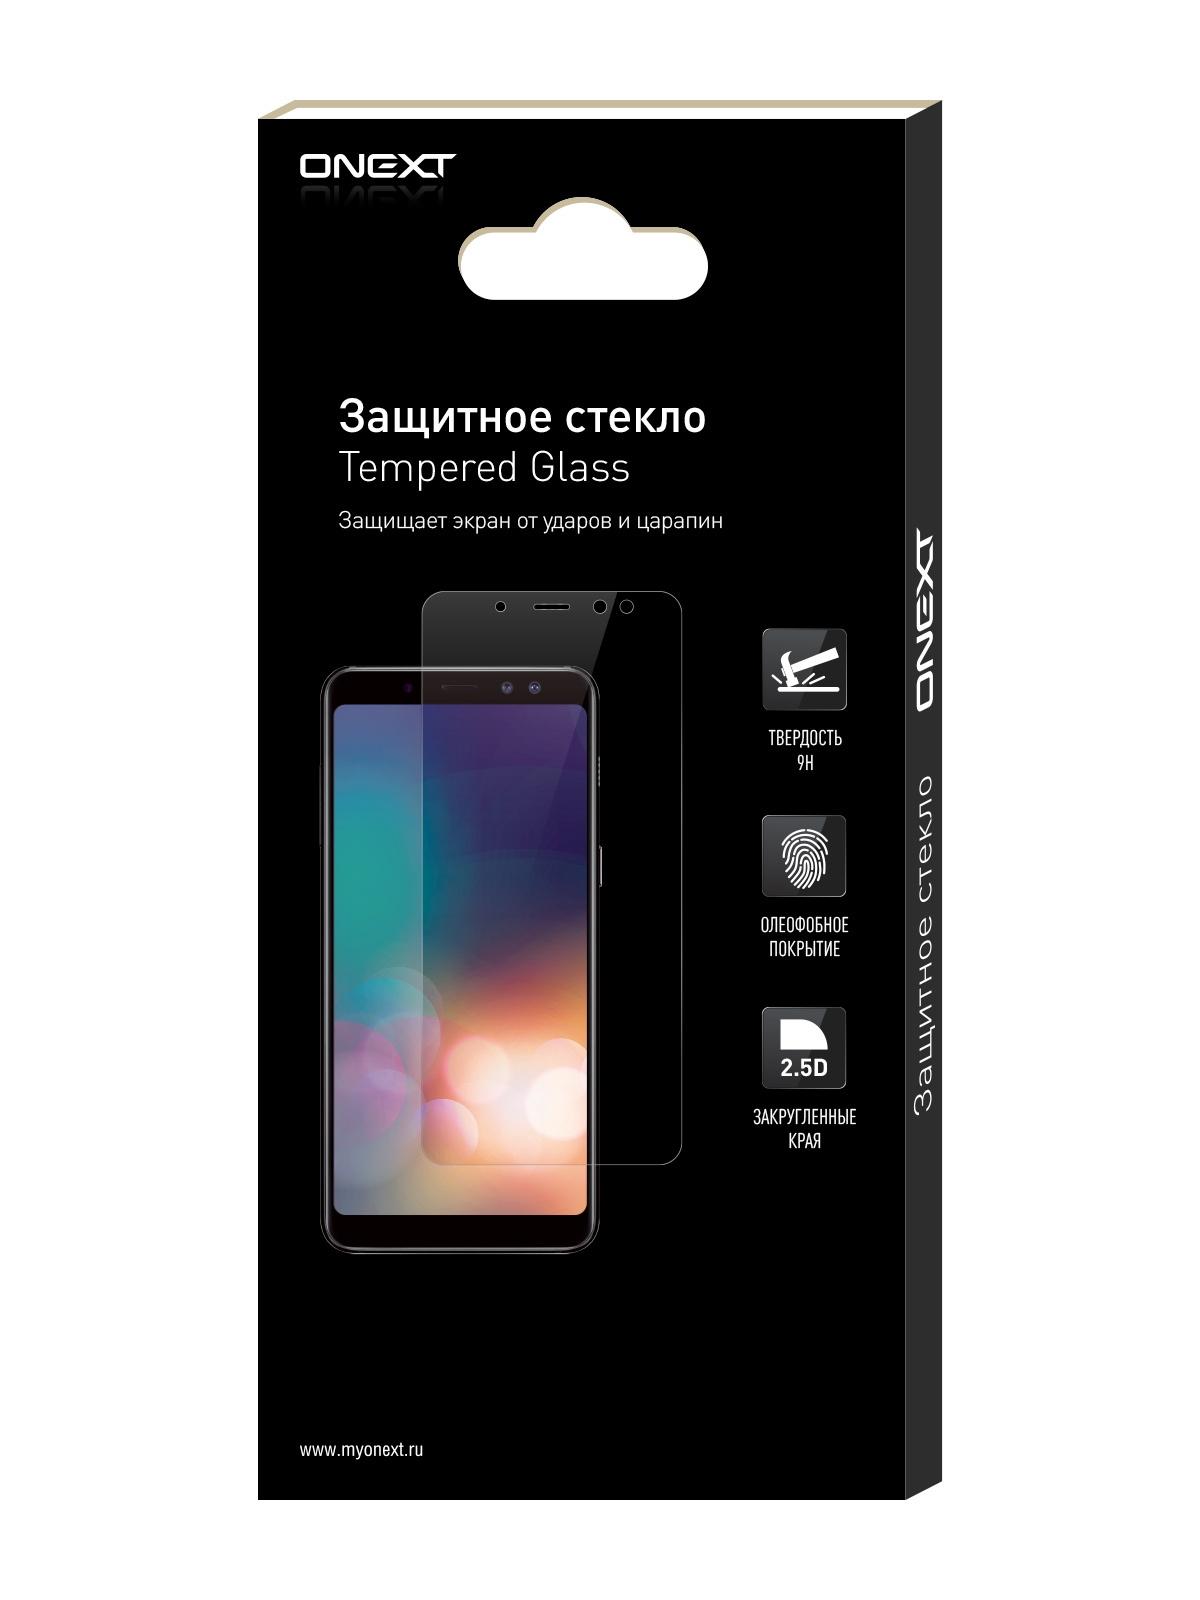 цена на Защитное стекло Onext для телефона Xiaomi Redmi Note 4